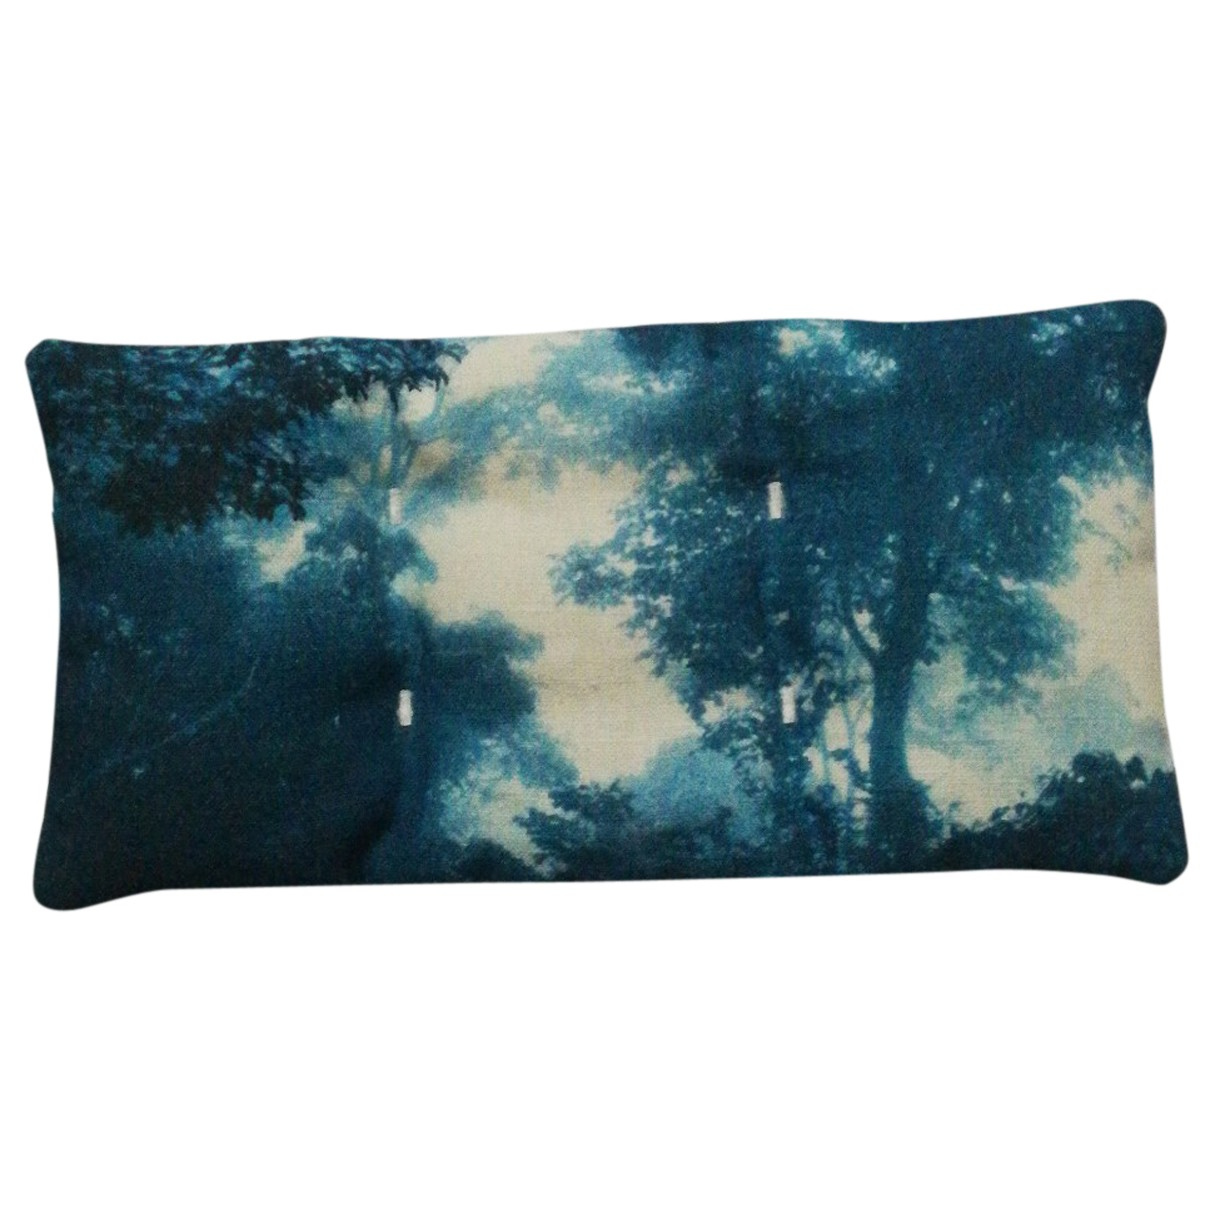 Chanel N Blue Cotton Textiles for Life & Living 20cm x10cm